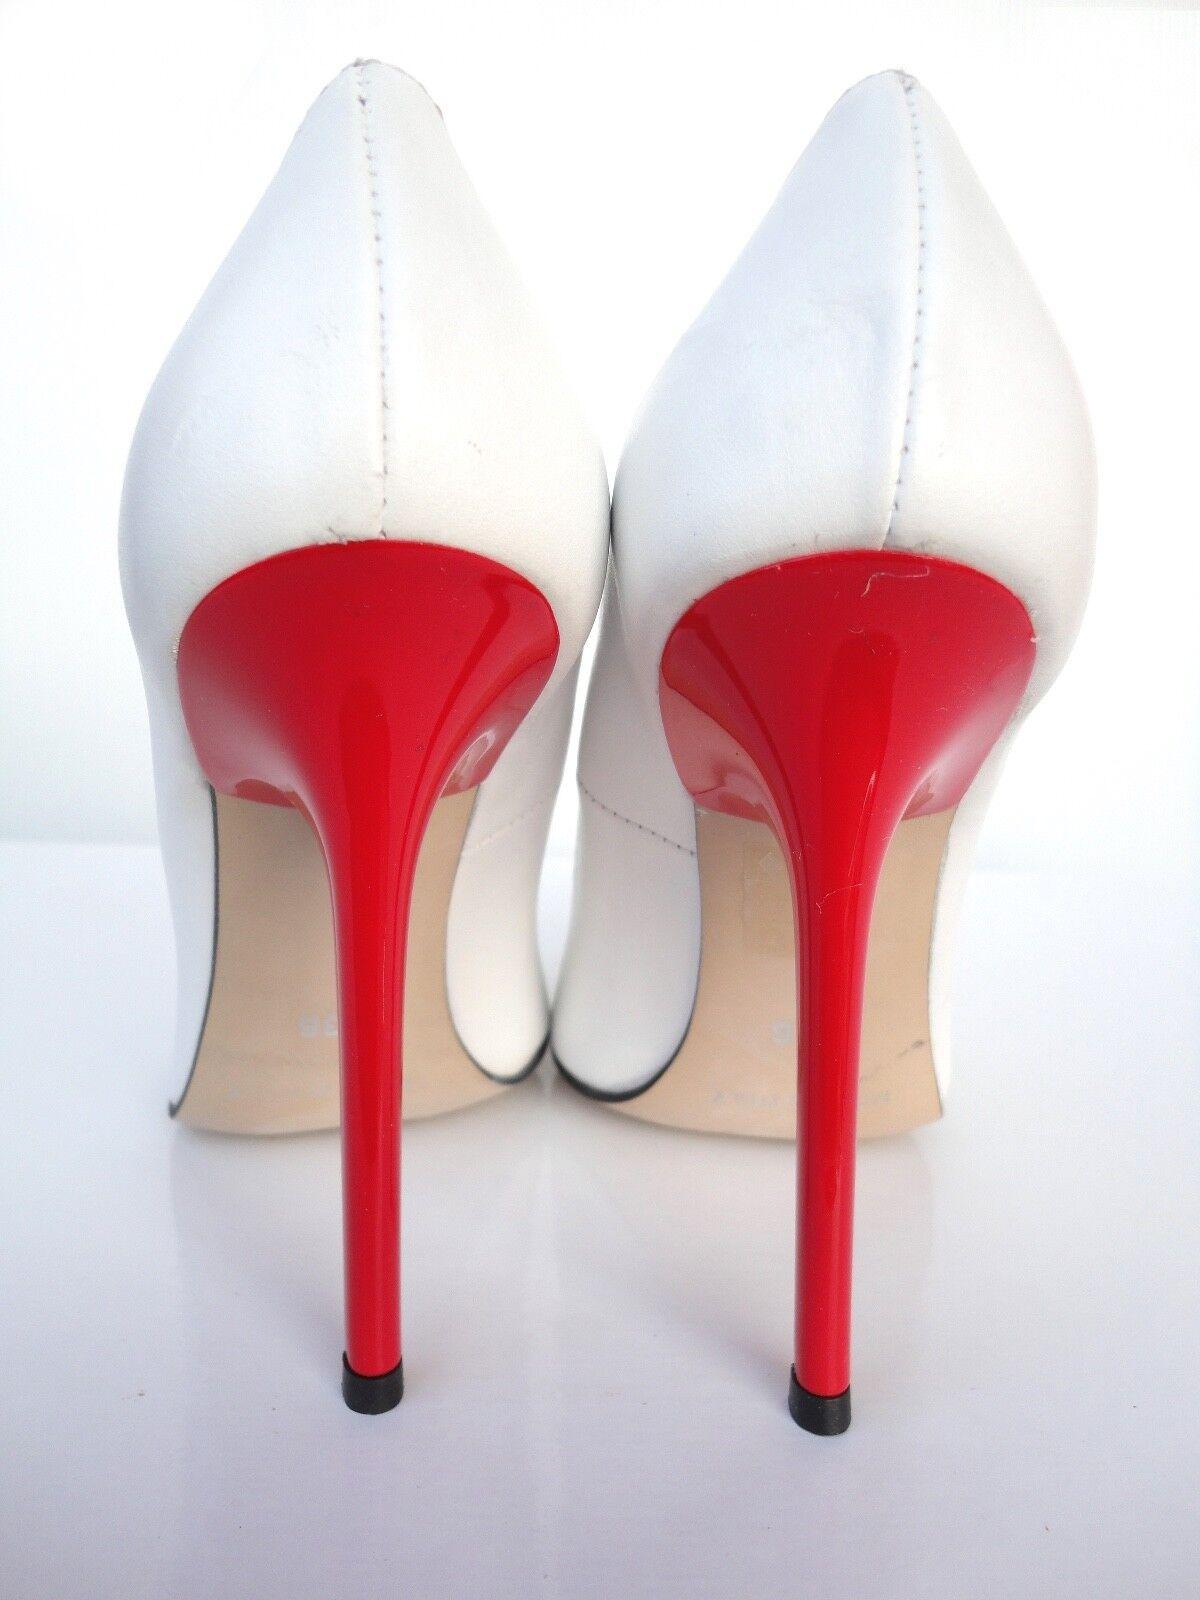 Gioiel Italia rosso Heels Pointy Toe PUMPS scarpe Leather  Decolte bianca 44  in linea